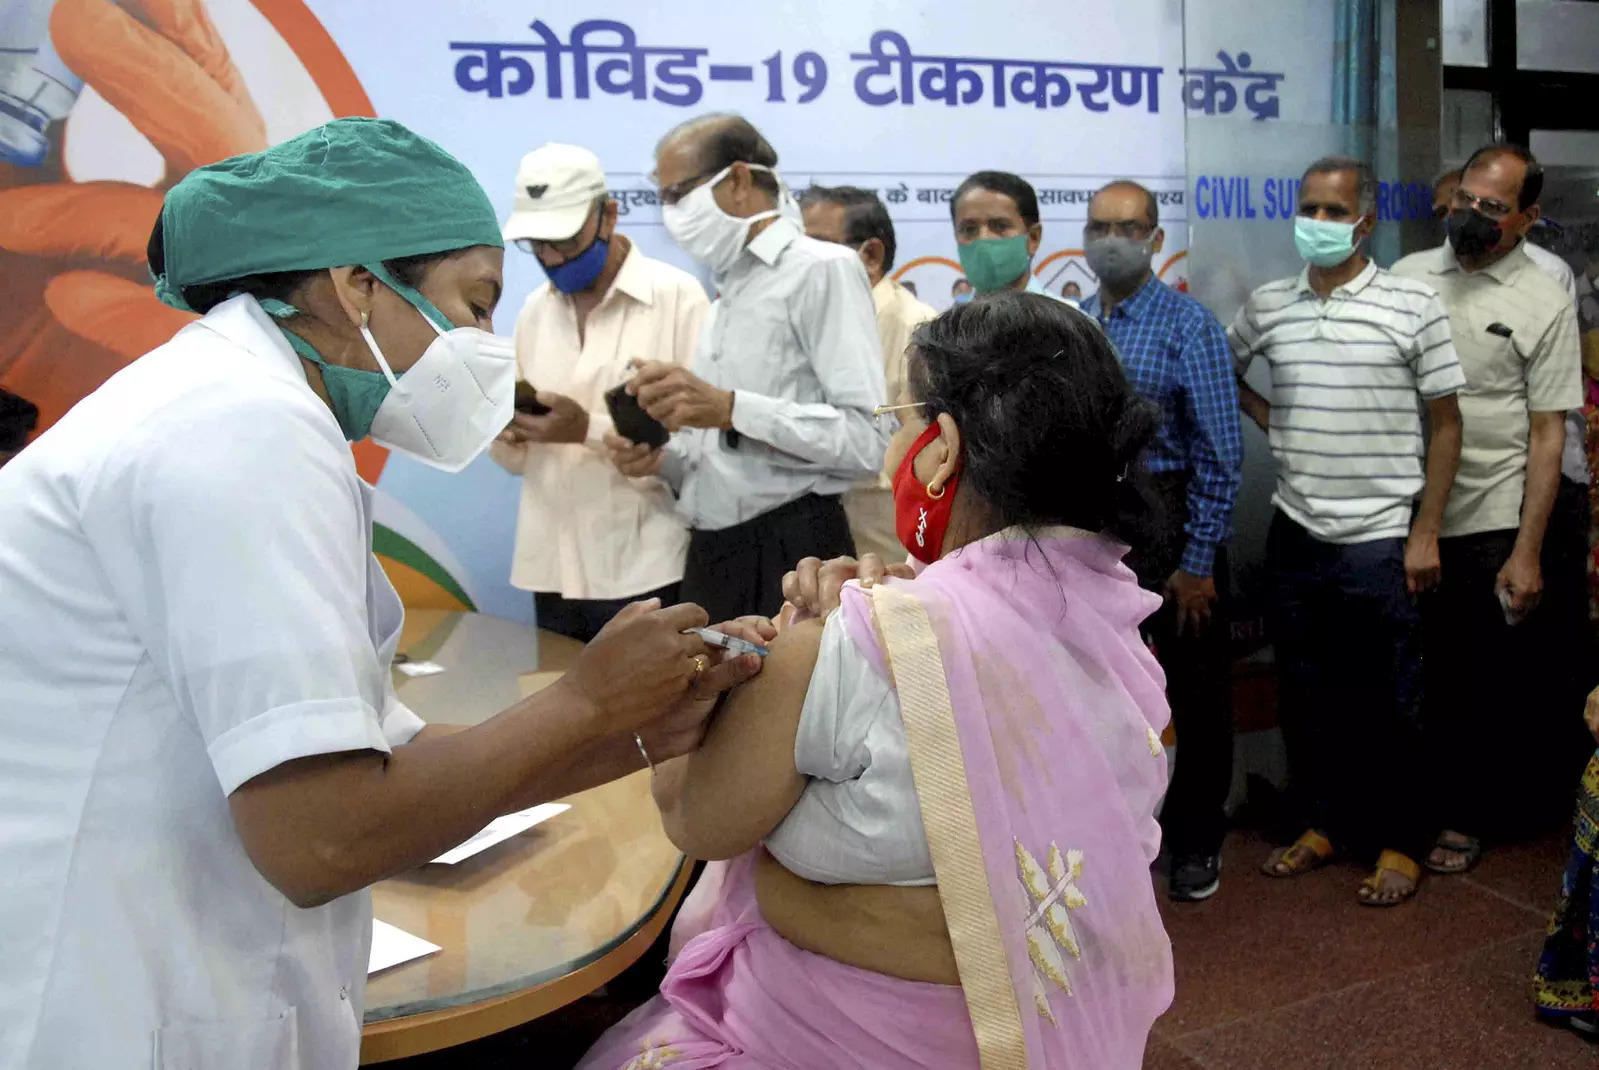 Pune: Citizens allege local corporators helping people jump jab queues